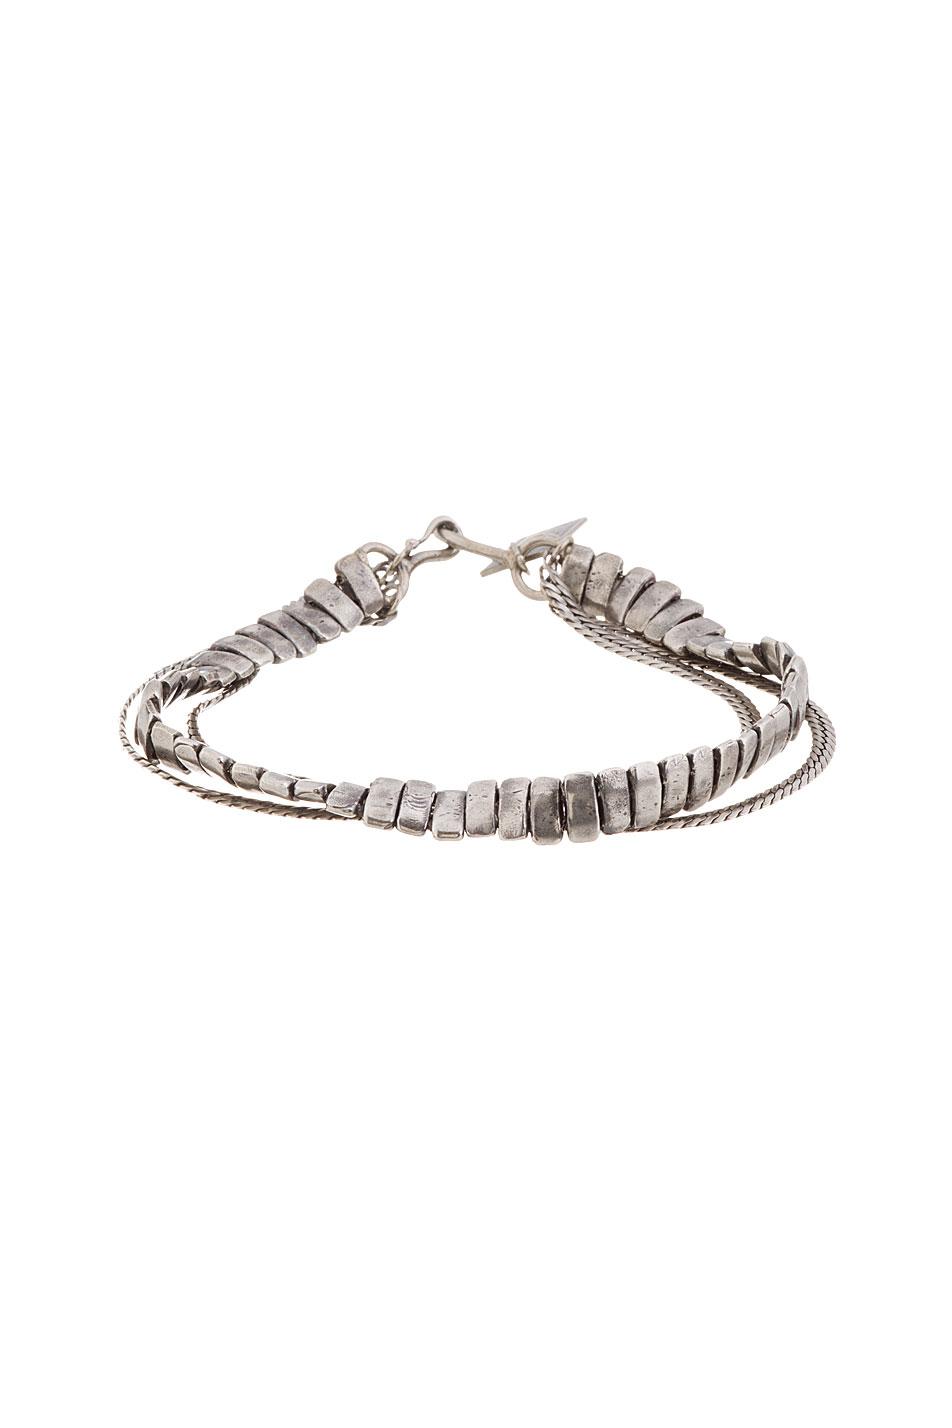 Goti antiqued silver flat chain bracelet